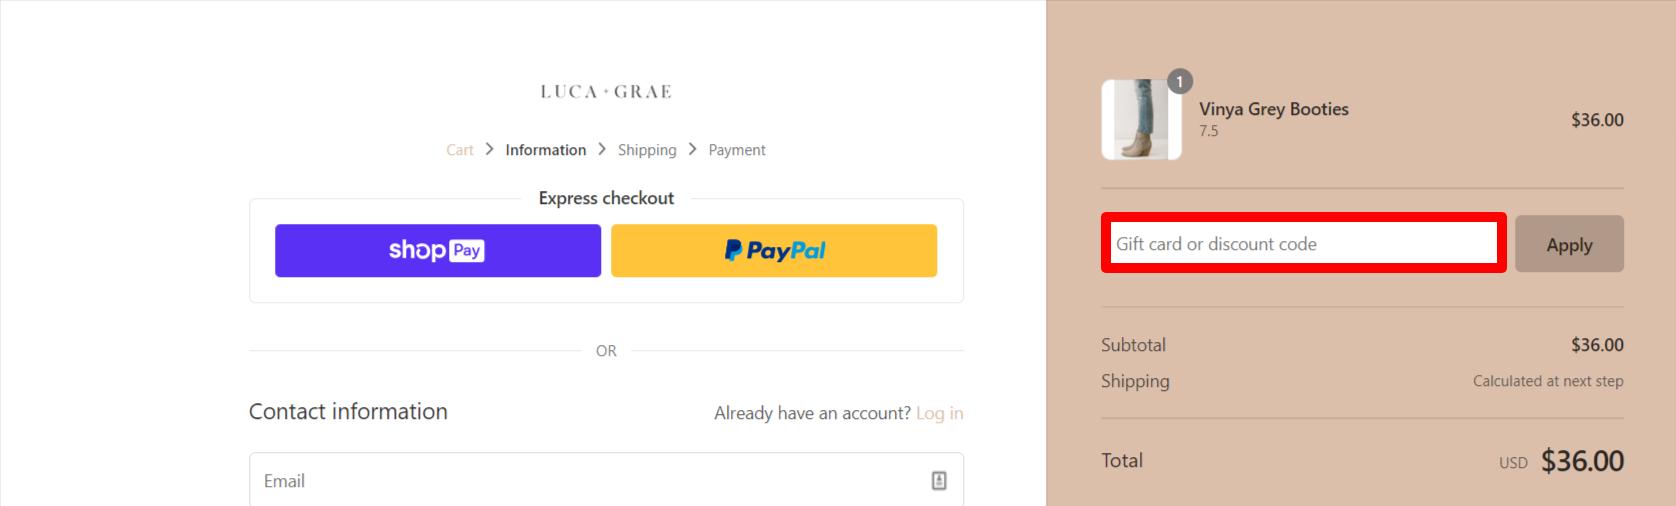 Luca + Grae Discount Code